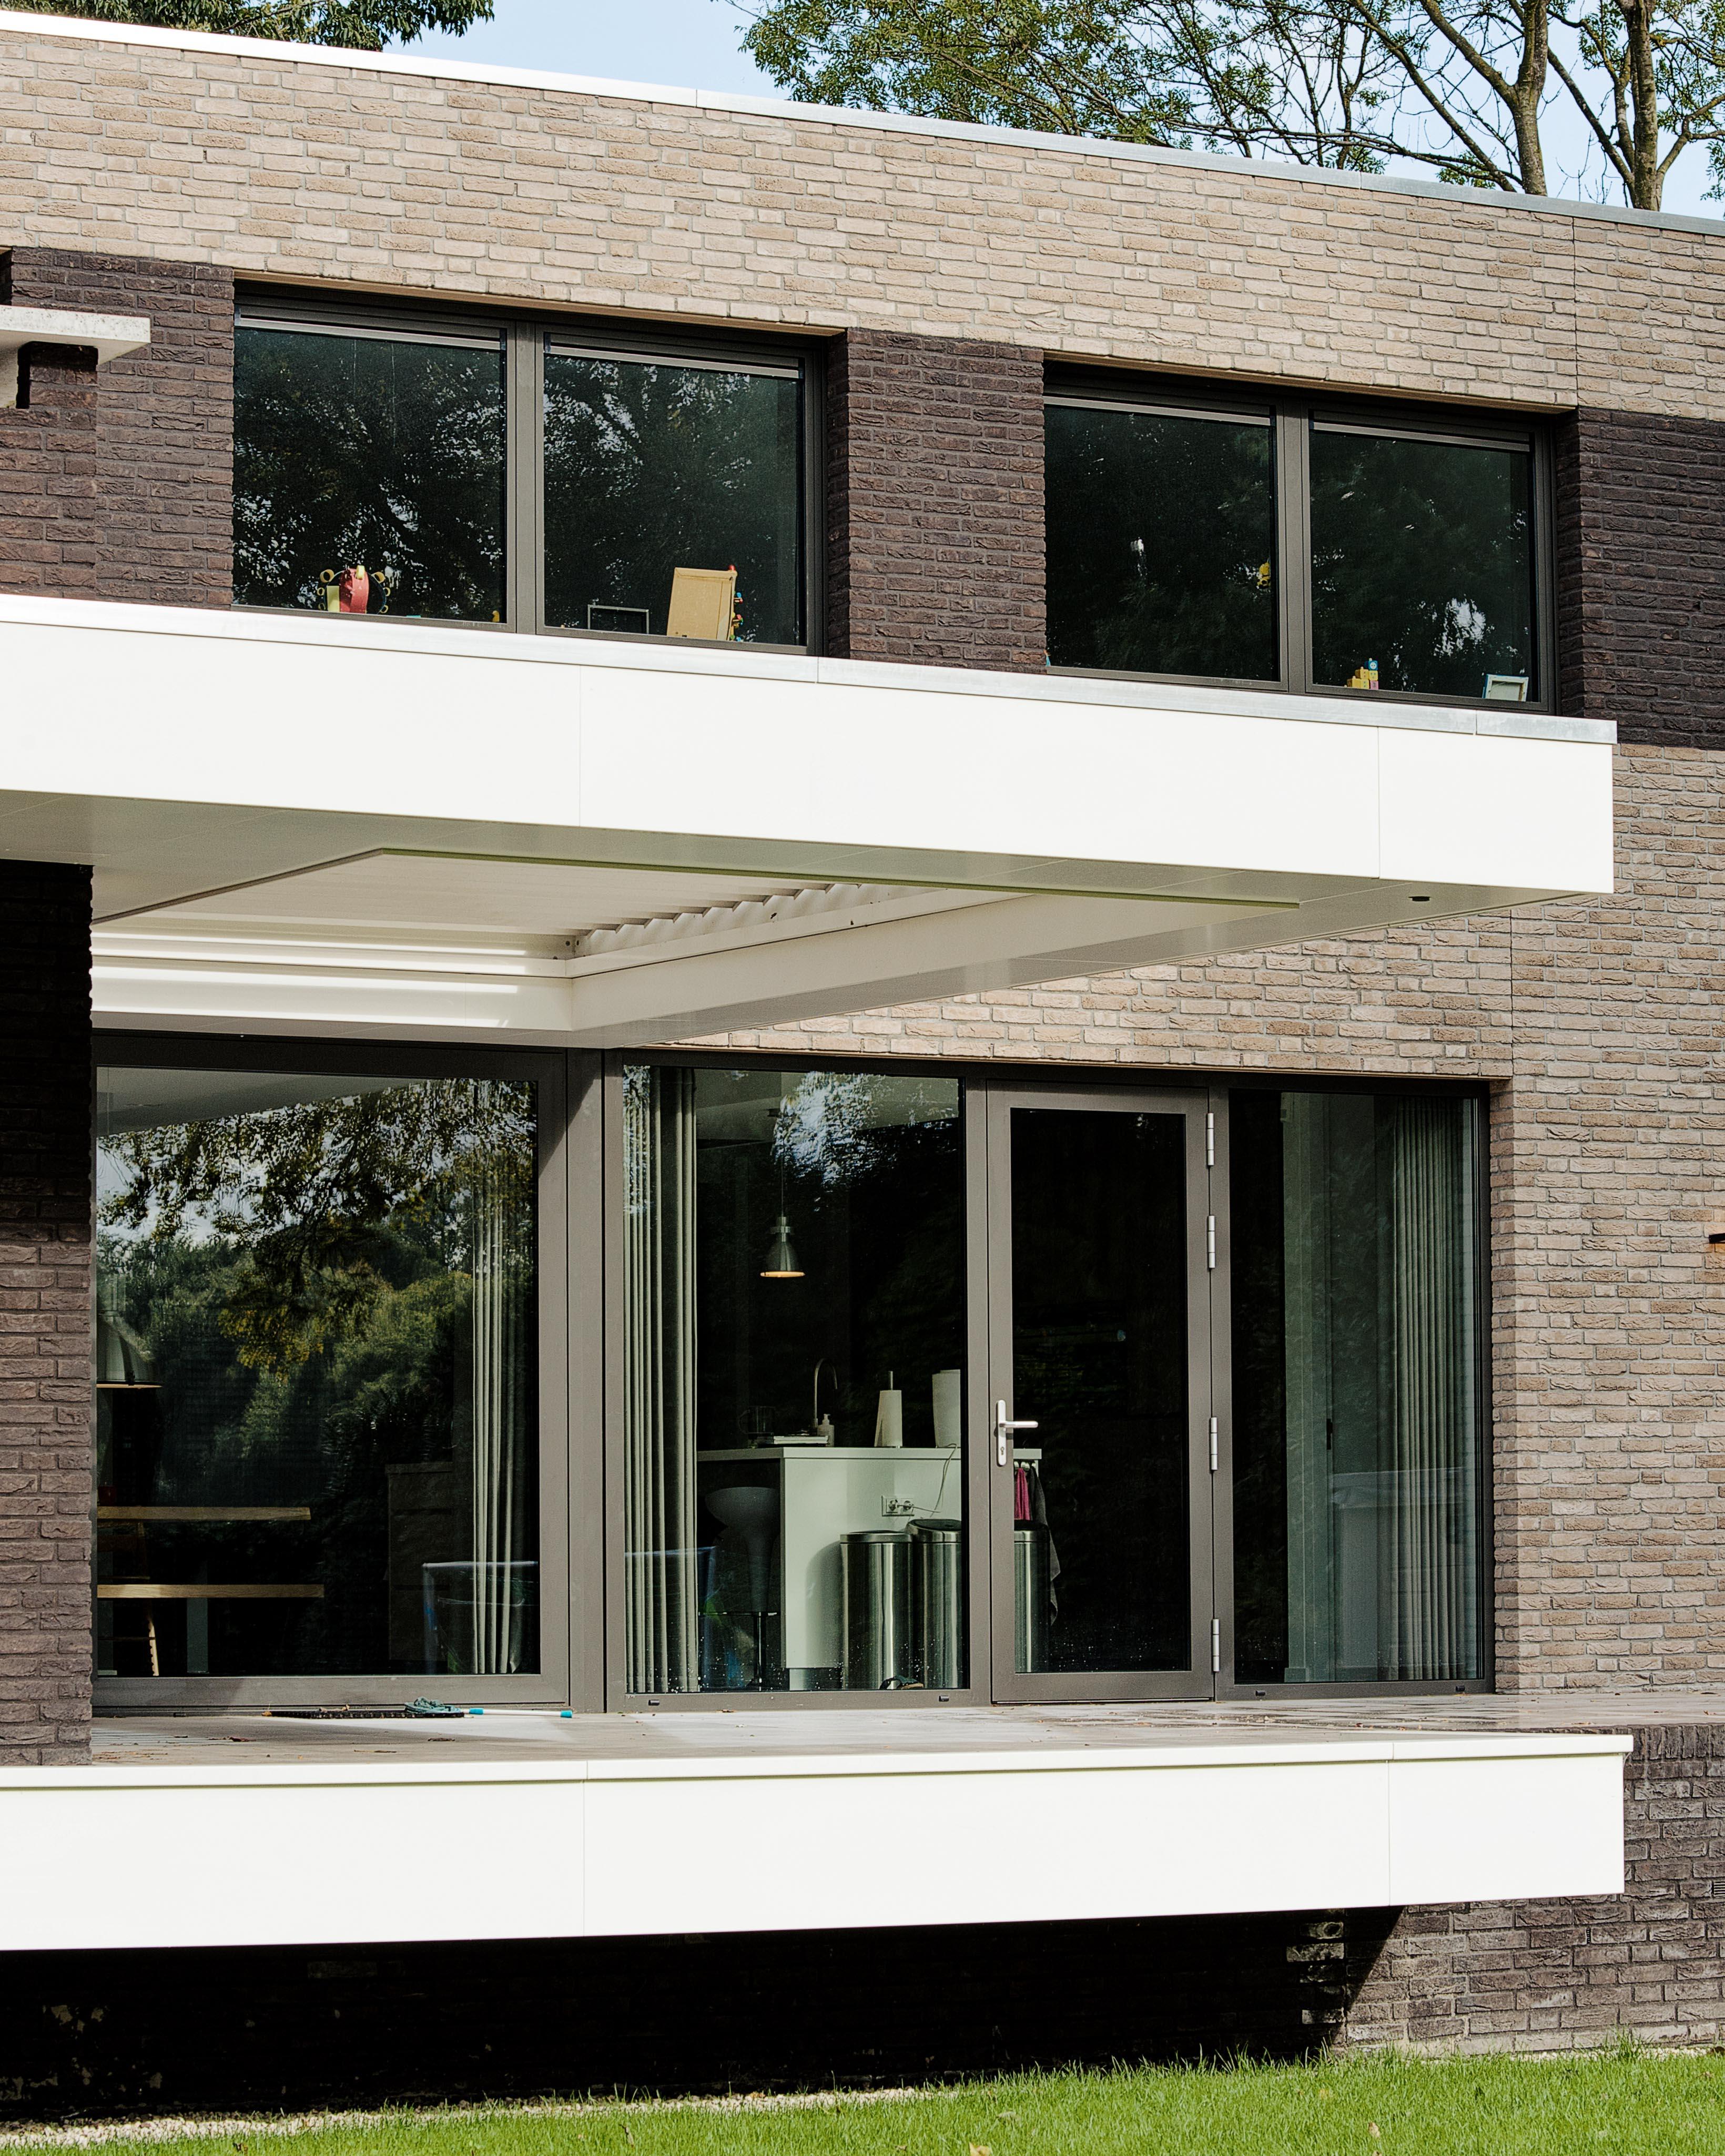 FPF_20170913_BB_Architecten_Valentijnlaan_Breda025